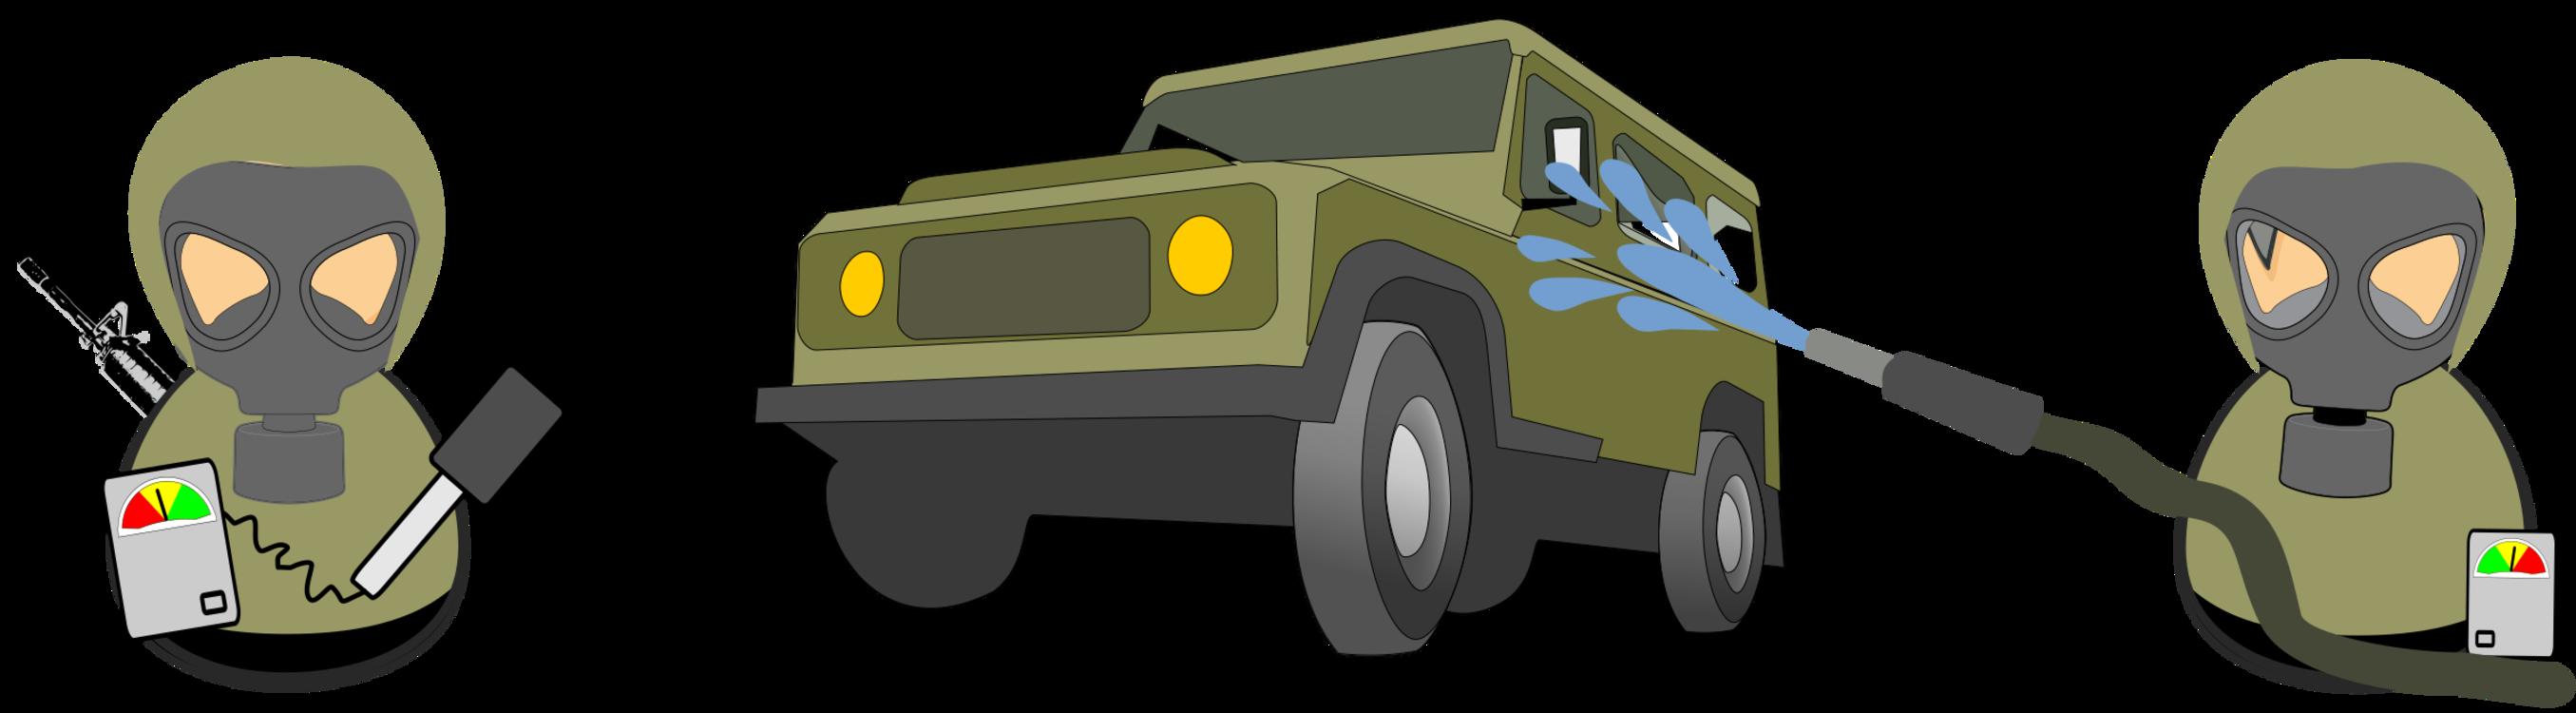 Machine,Automotive Design,Vehicle